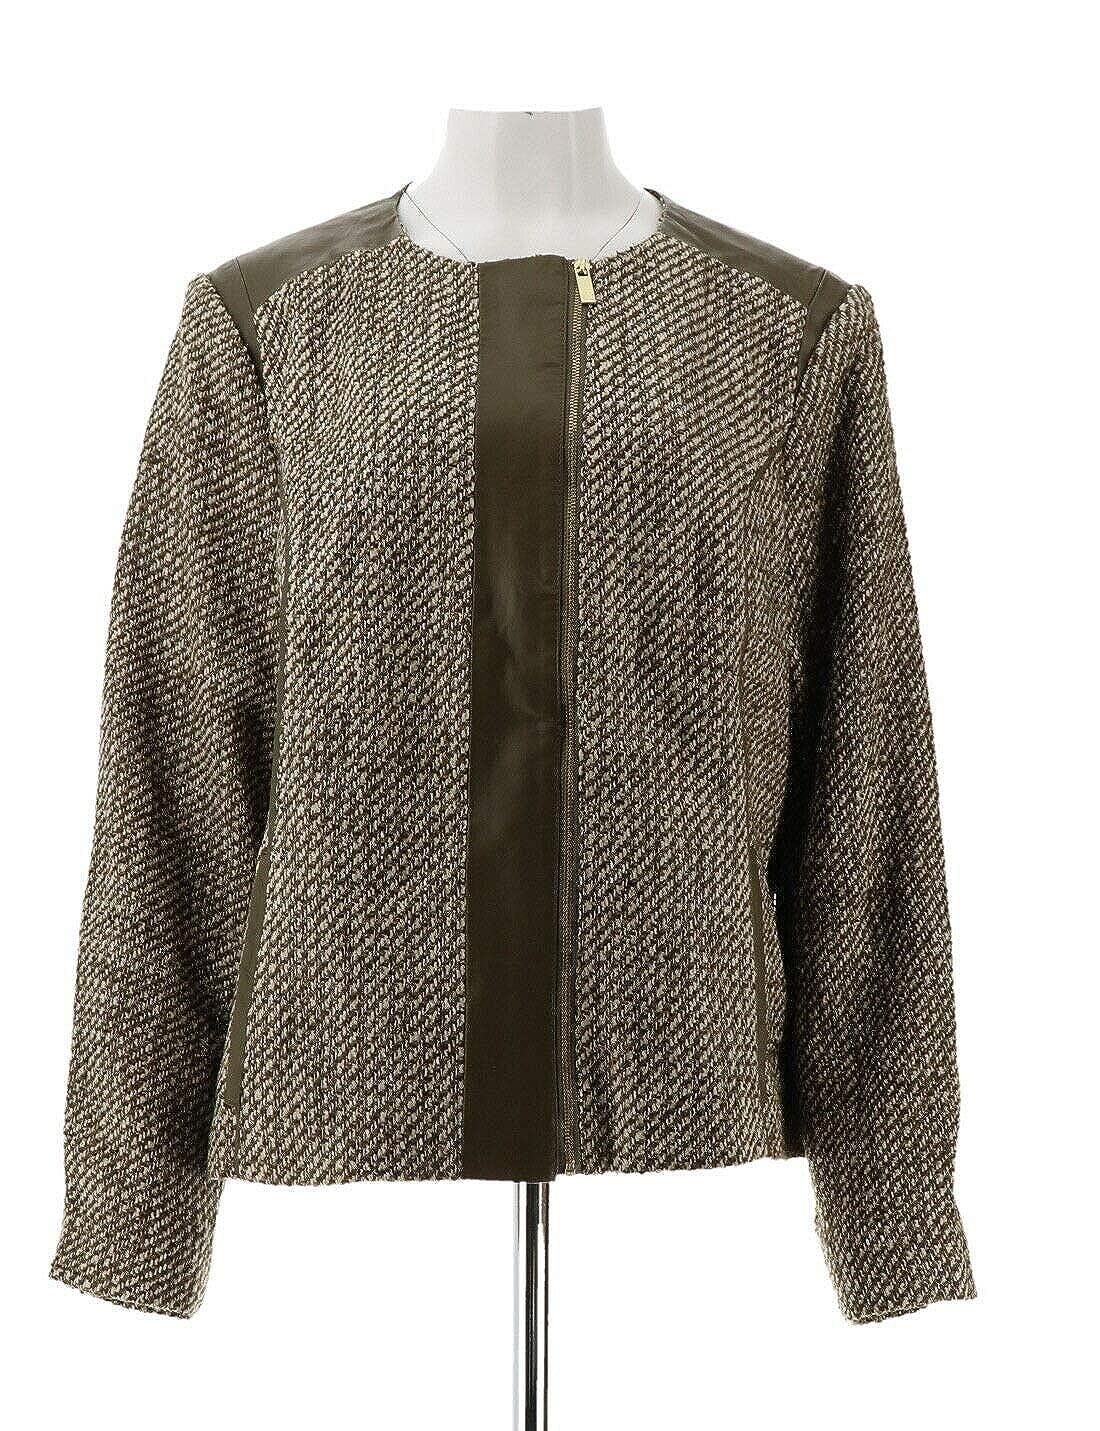 Liz Claiborne NY Heritage Collection Tweed Jacket A272811